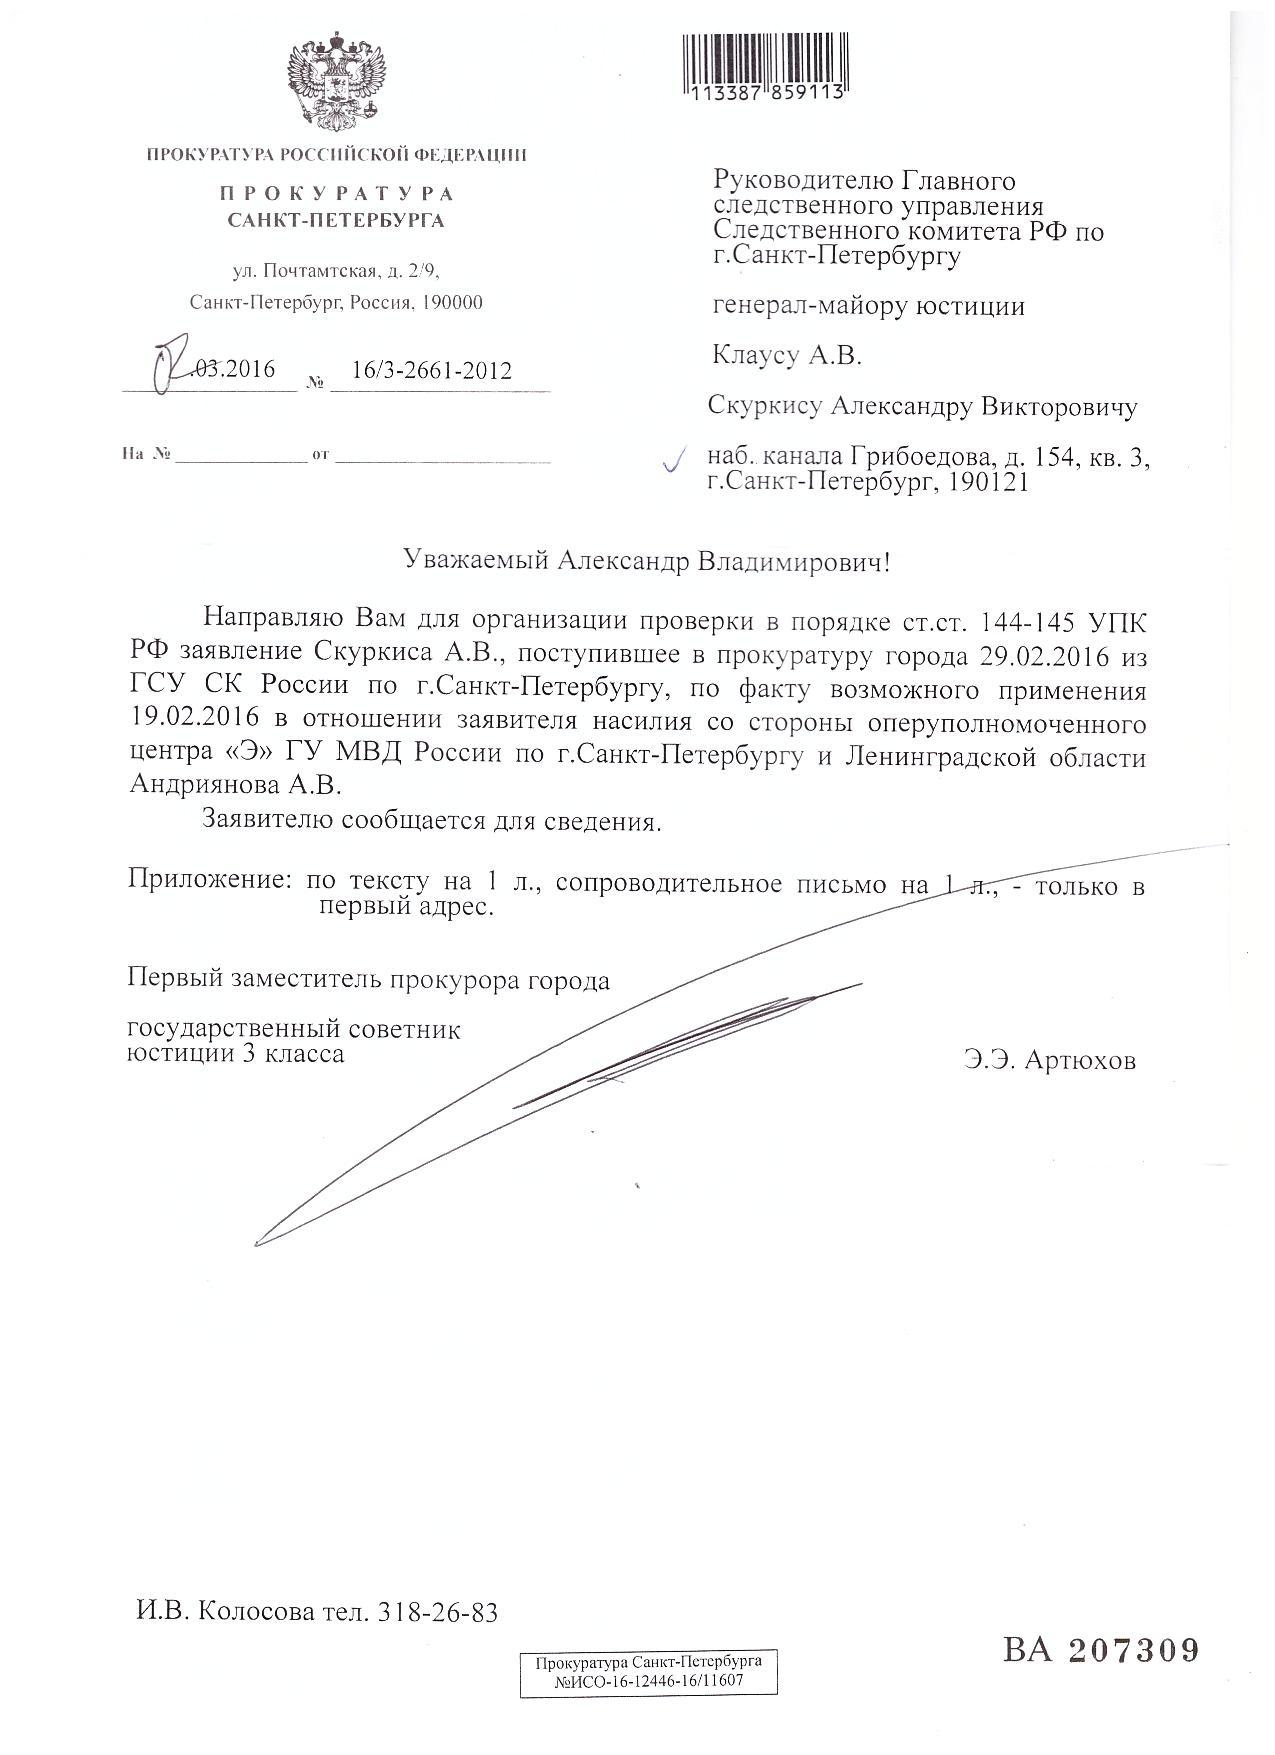 Артюхов-Клаусу-144-145.jpg